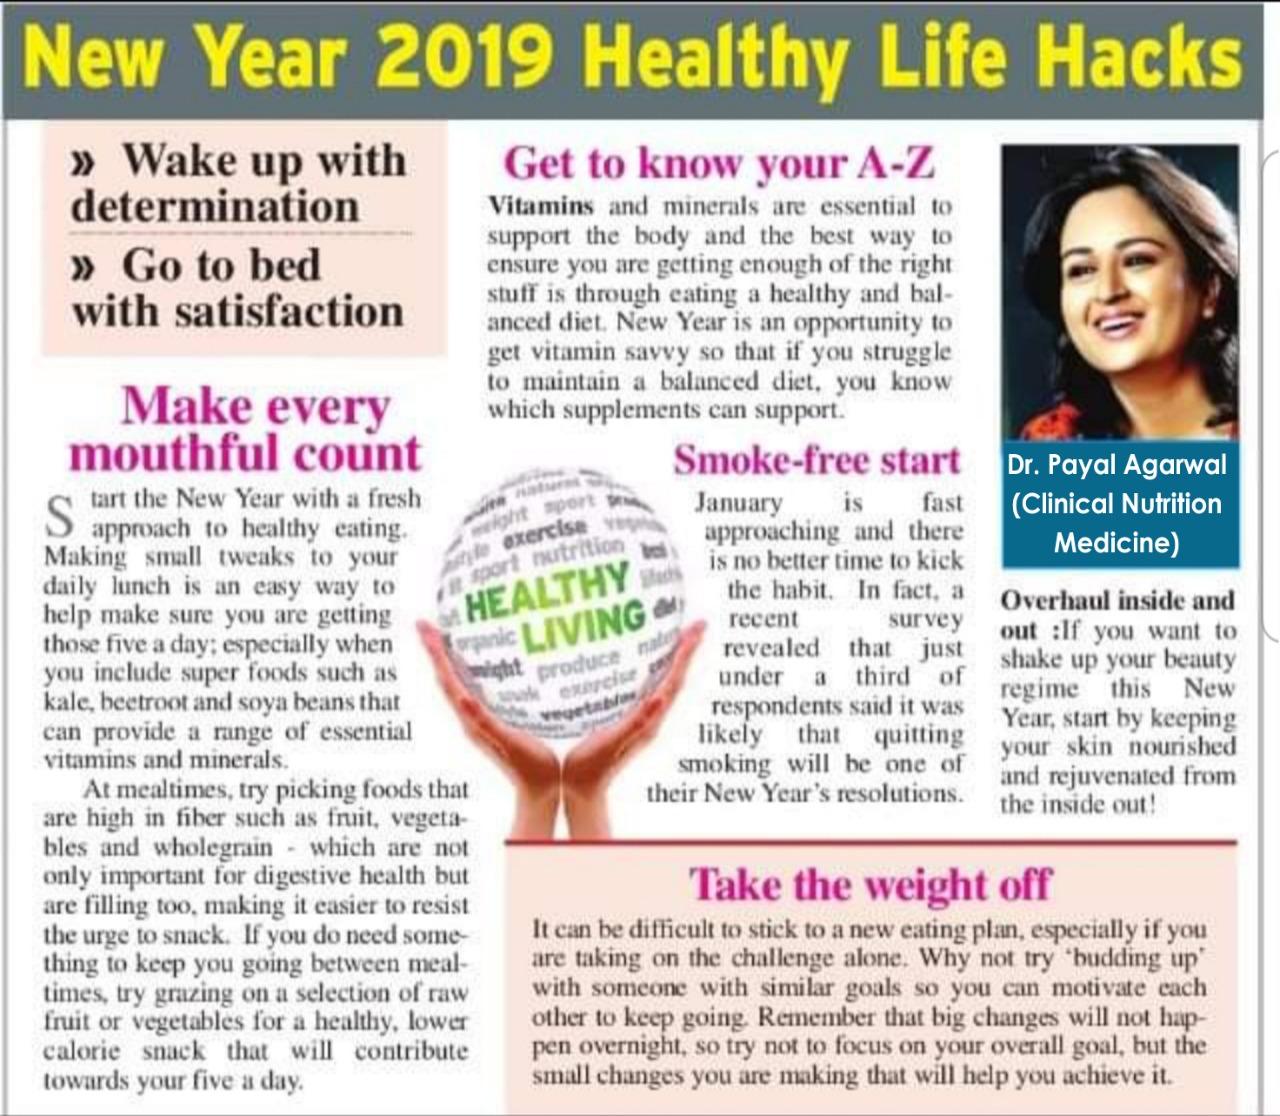 New Year 2019 Healthy Life Hacks